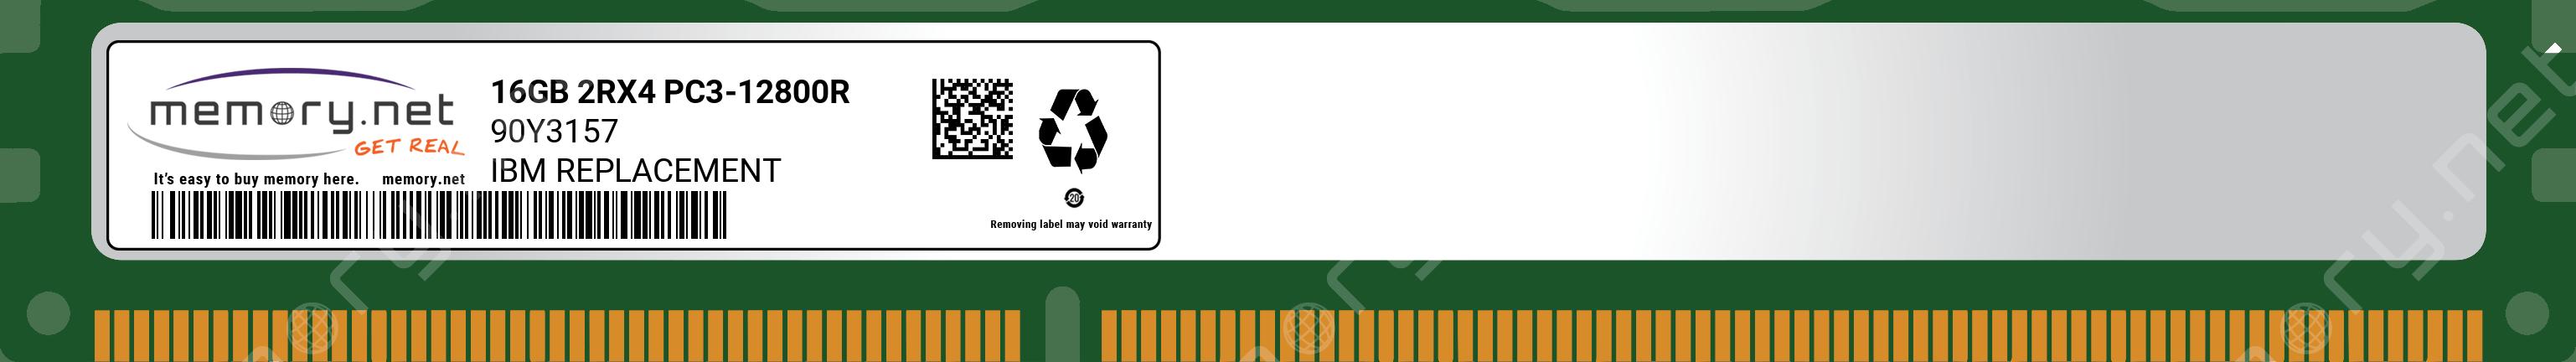 90Y3157